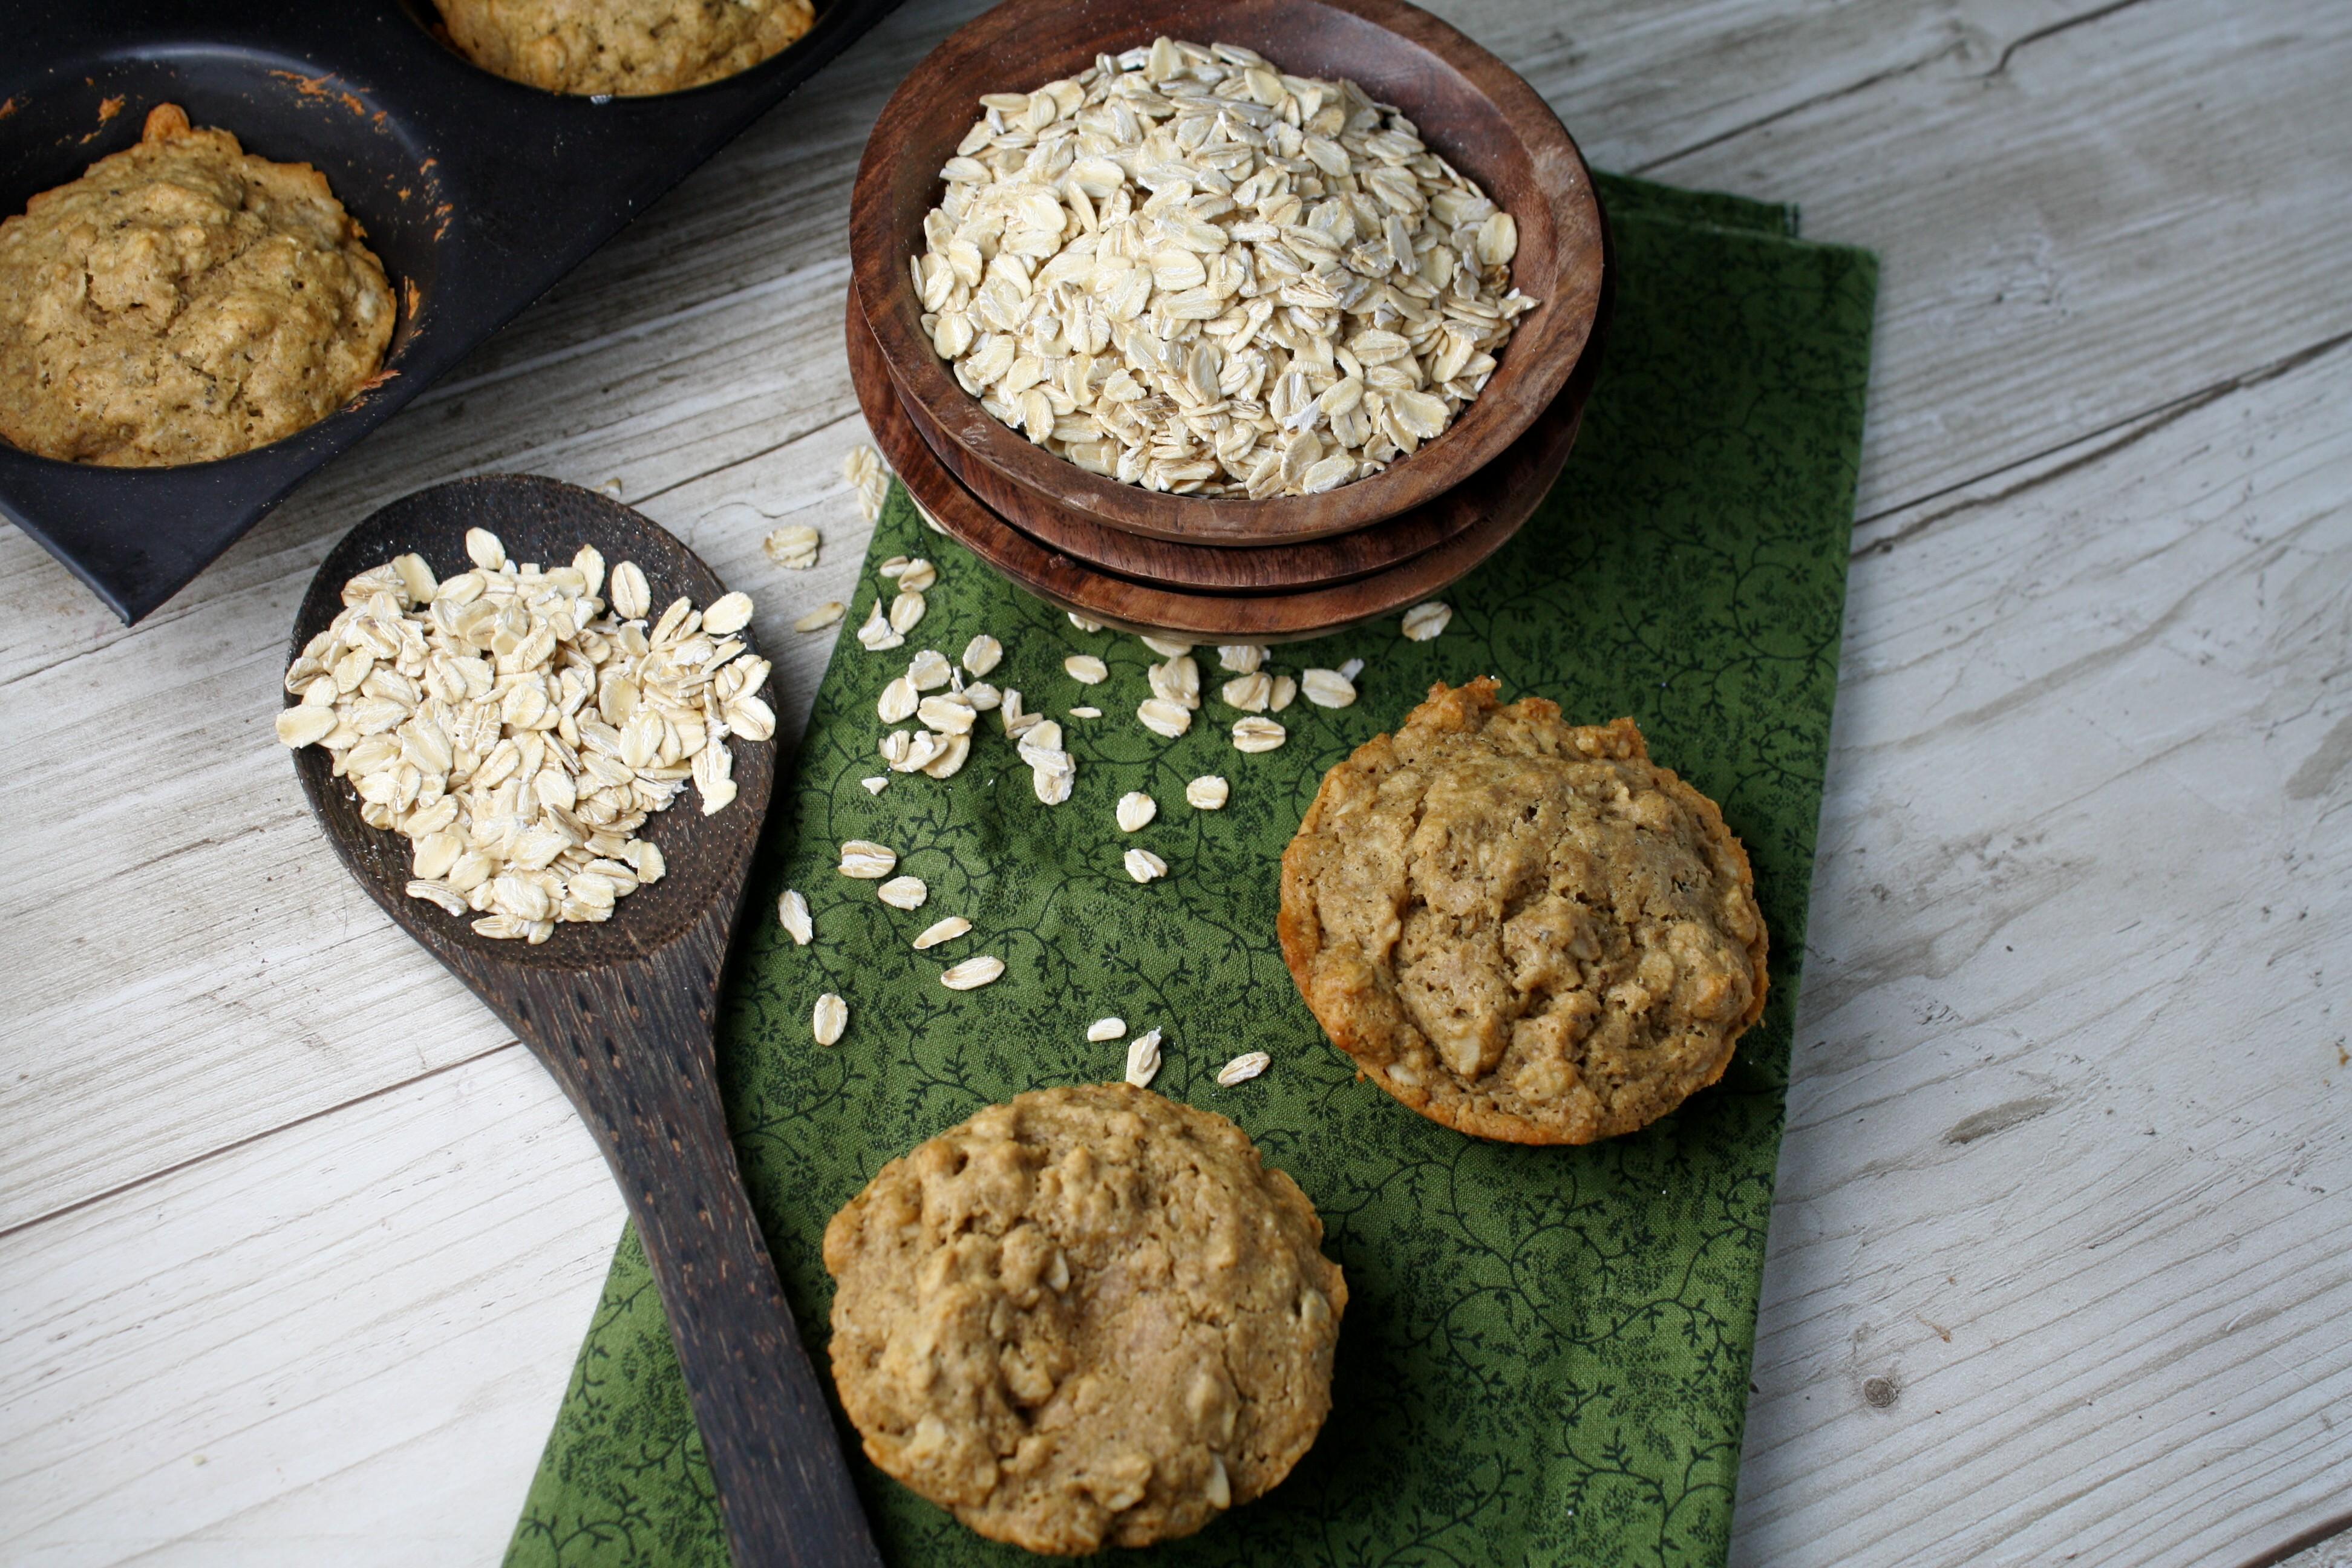 Oatmeal Muffins, Gluten Free & Vegan | Tessa the Domestic Diva